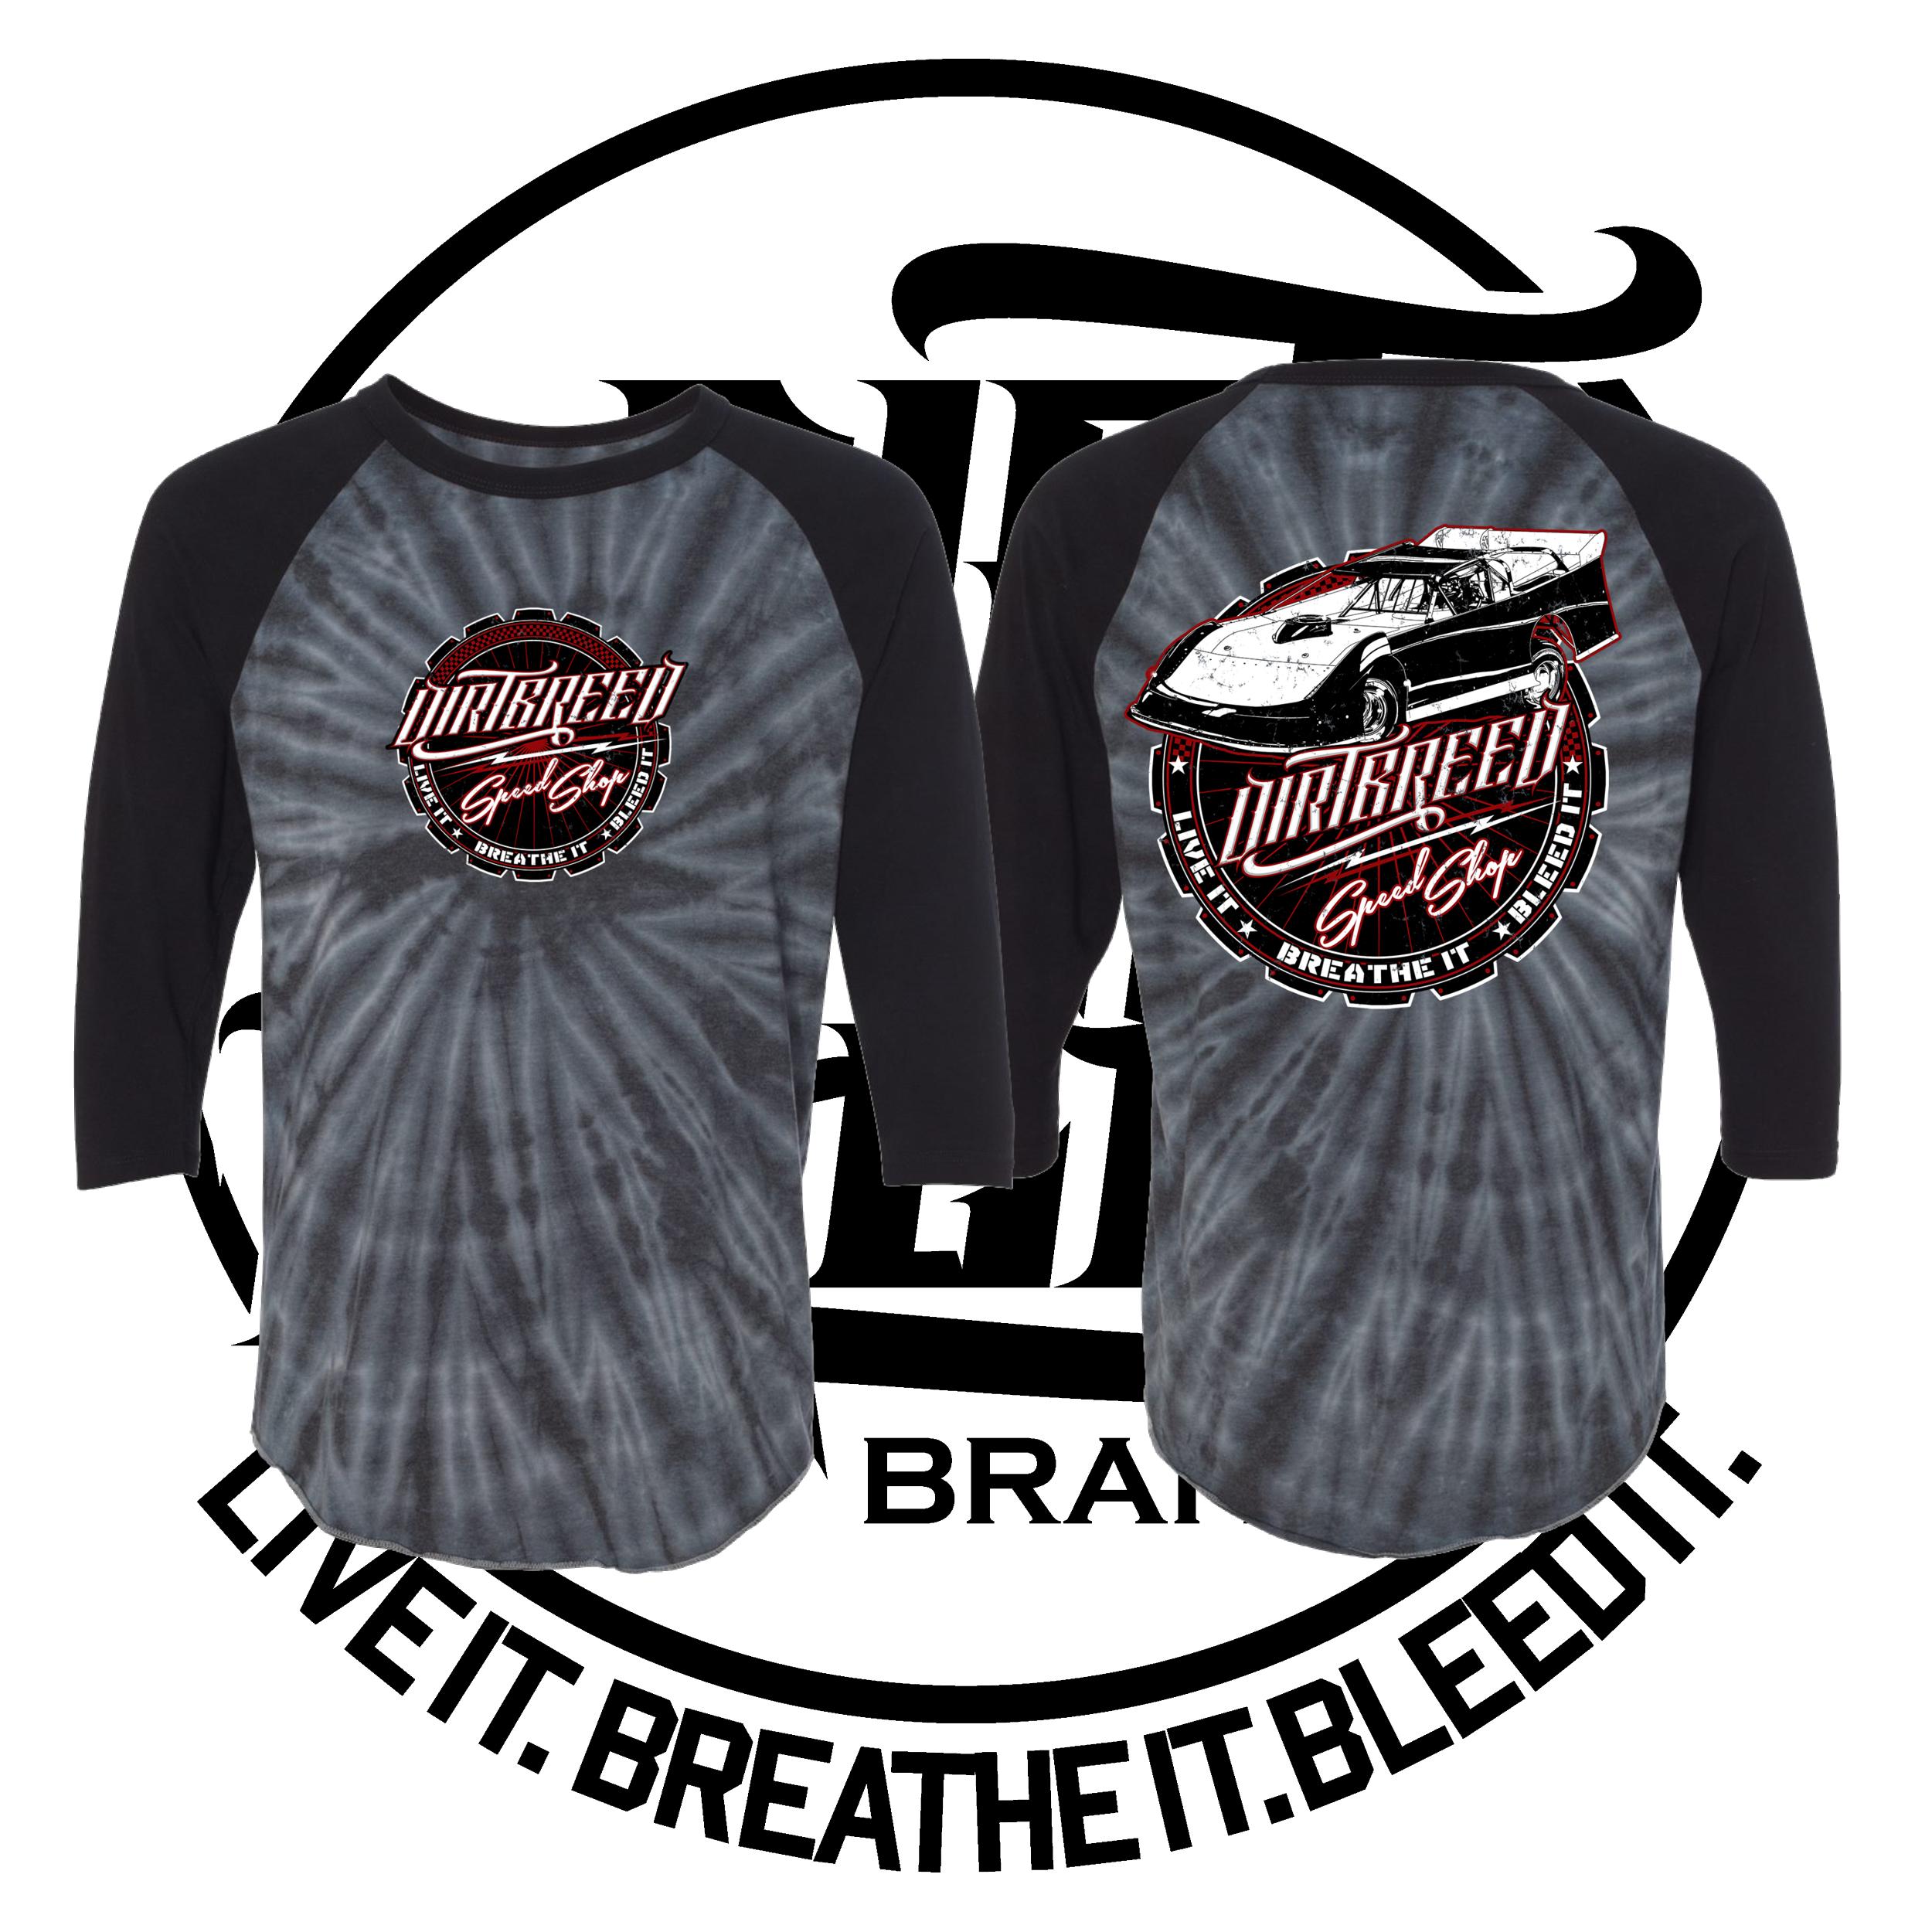 DirtBreed Speed Shop Tie Dye Dirt Track Racing Shirt